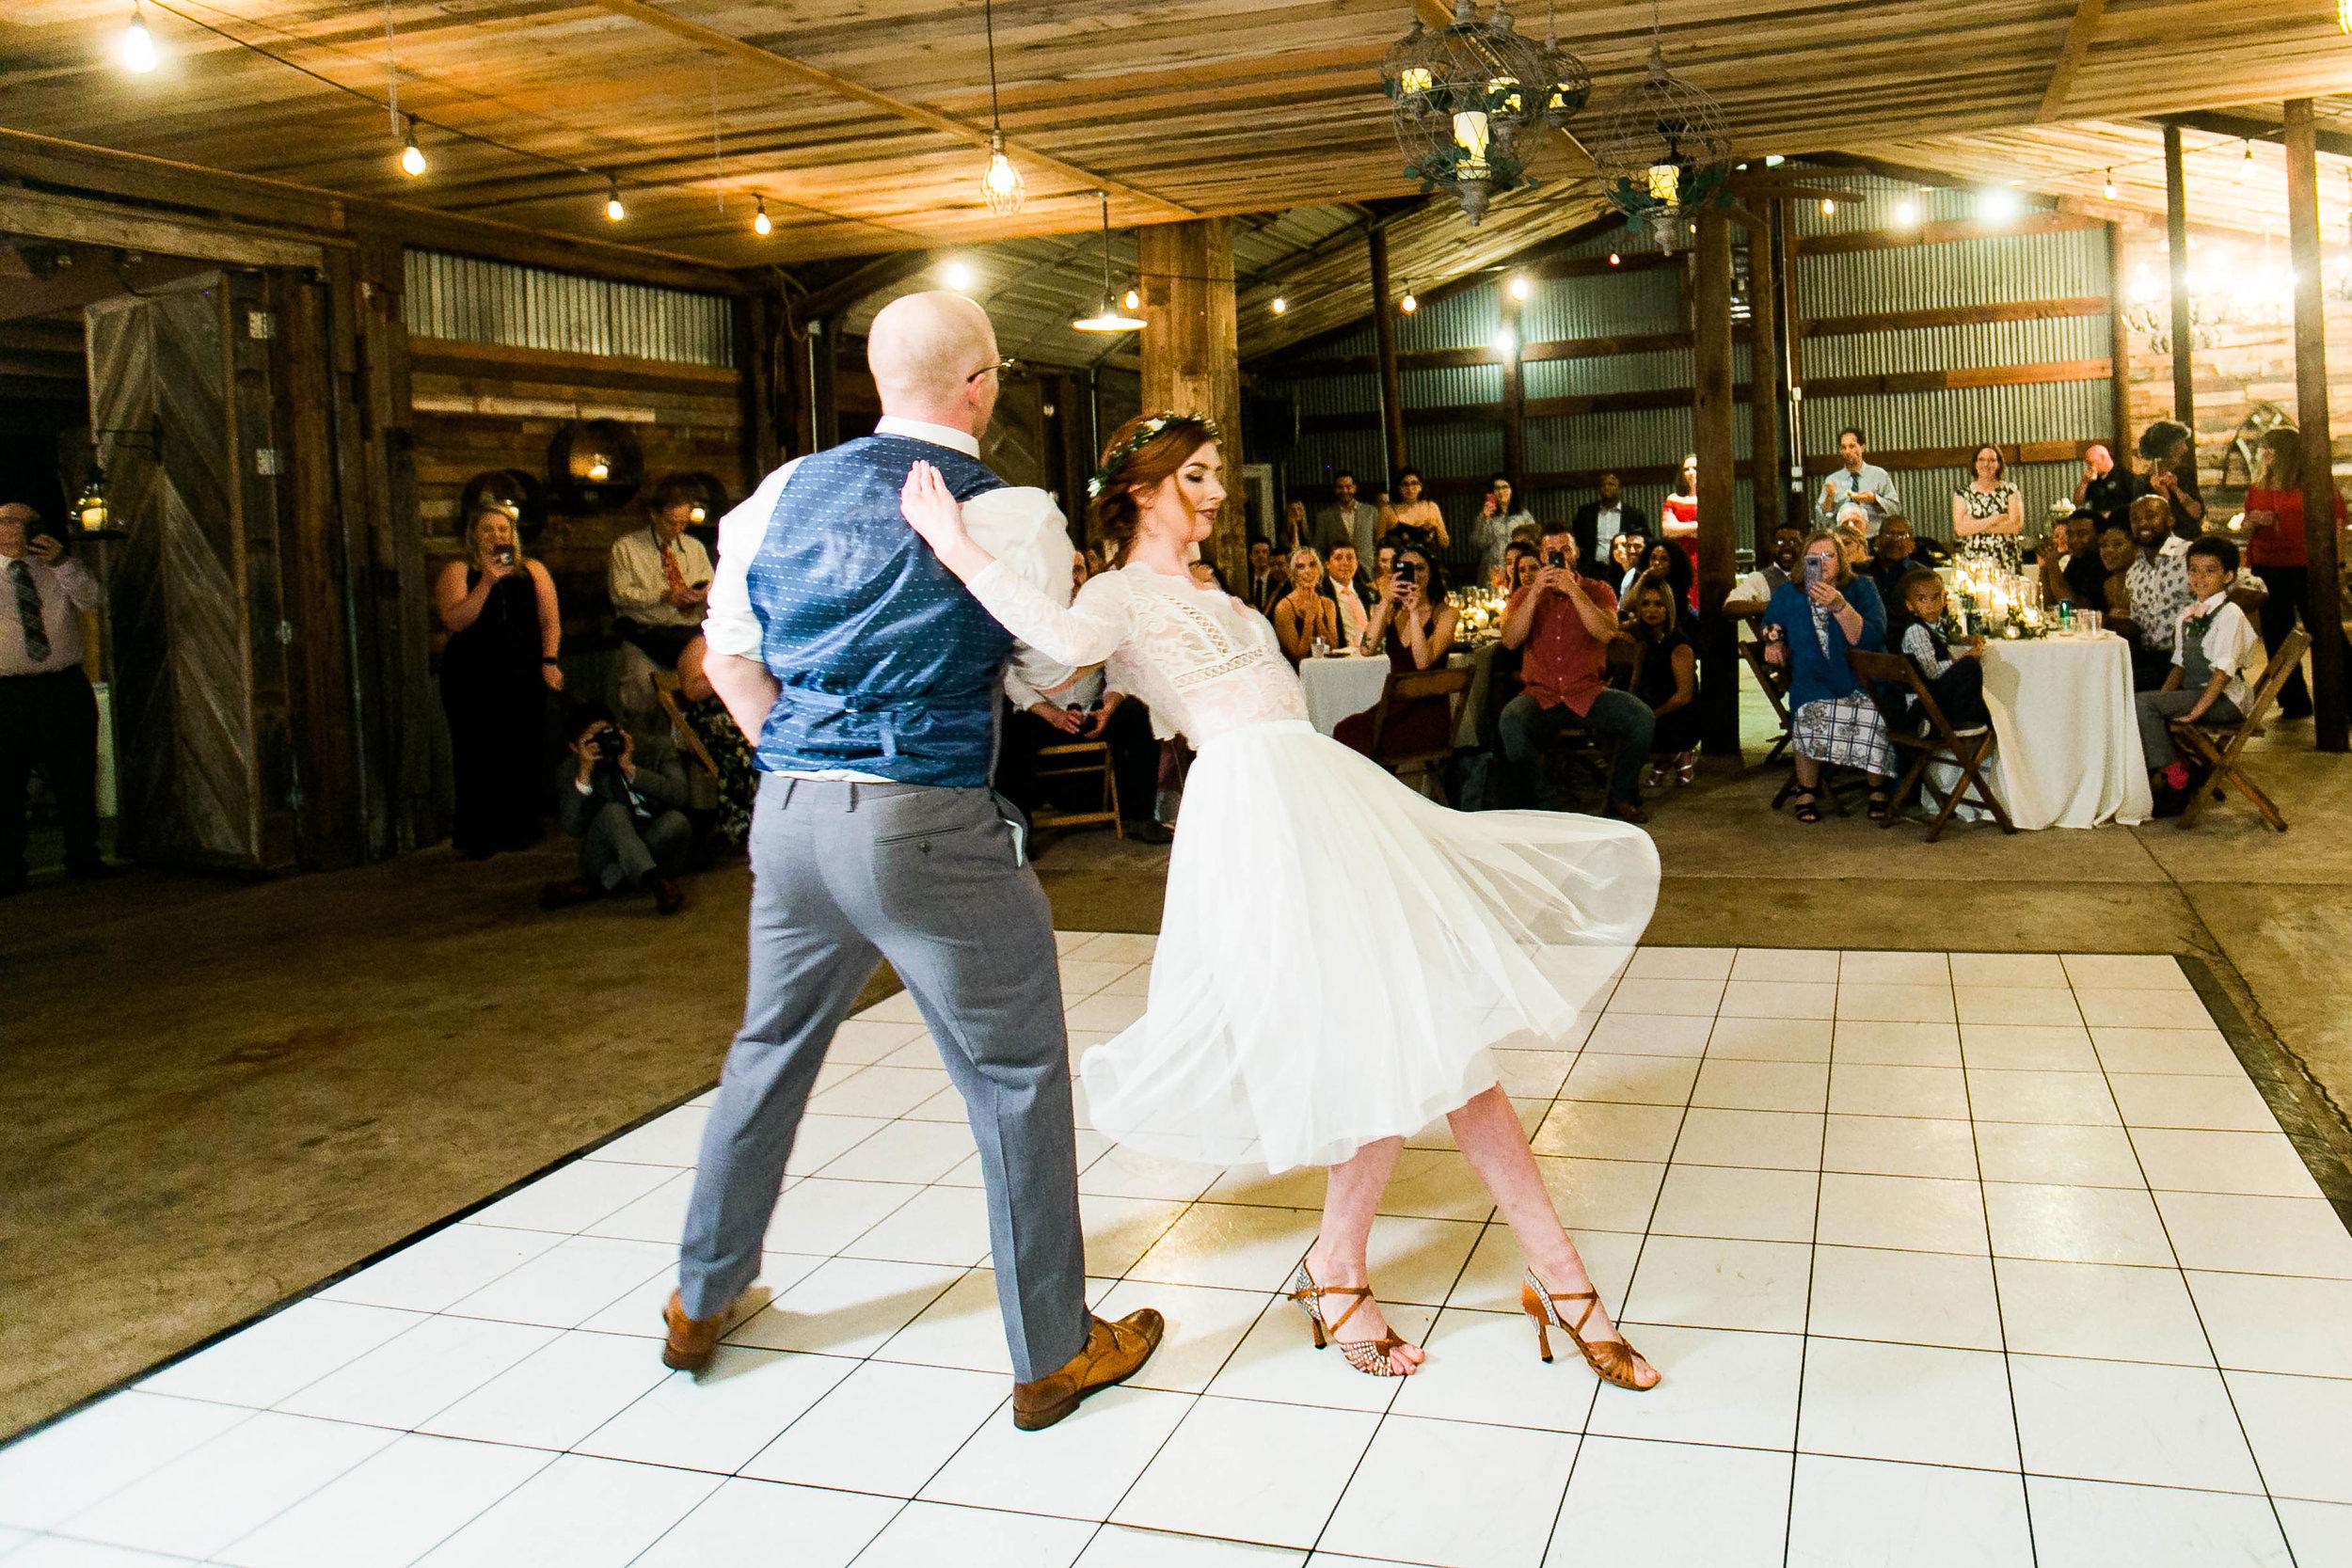 armstrong-wedding-671.jpg